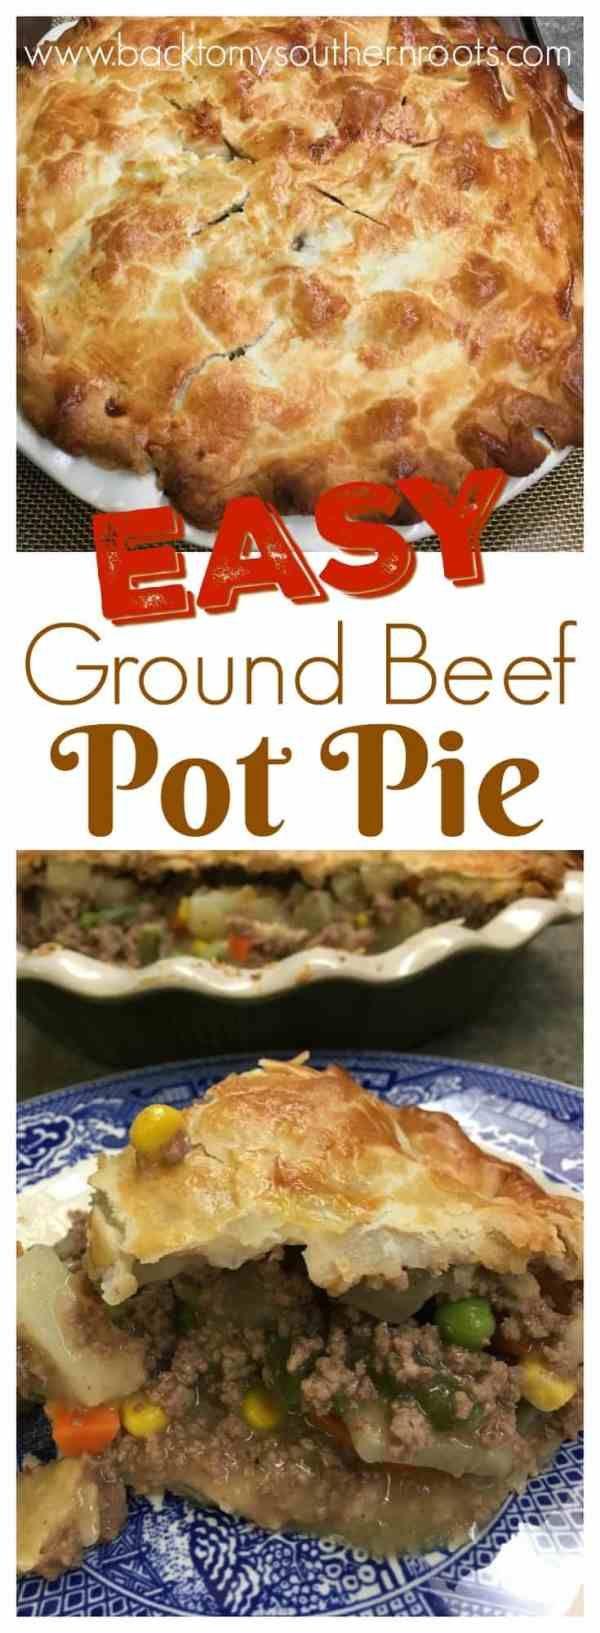 Easy Ground Beef Pot Pie images